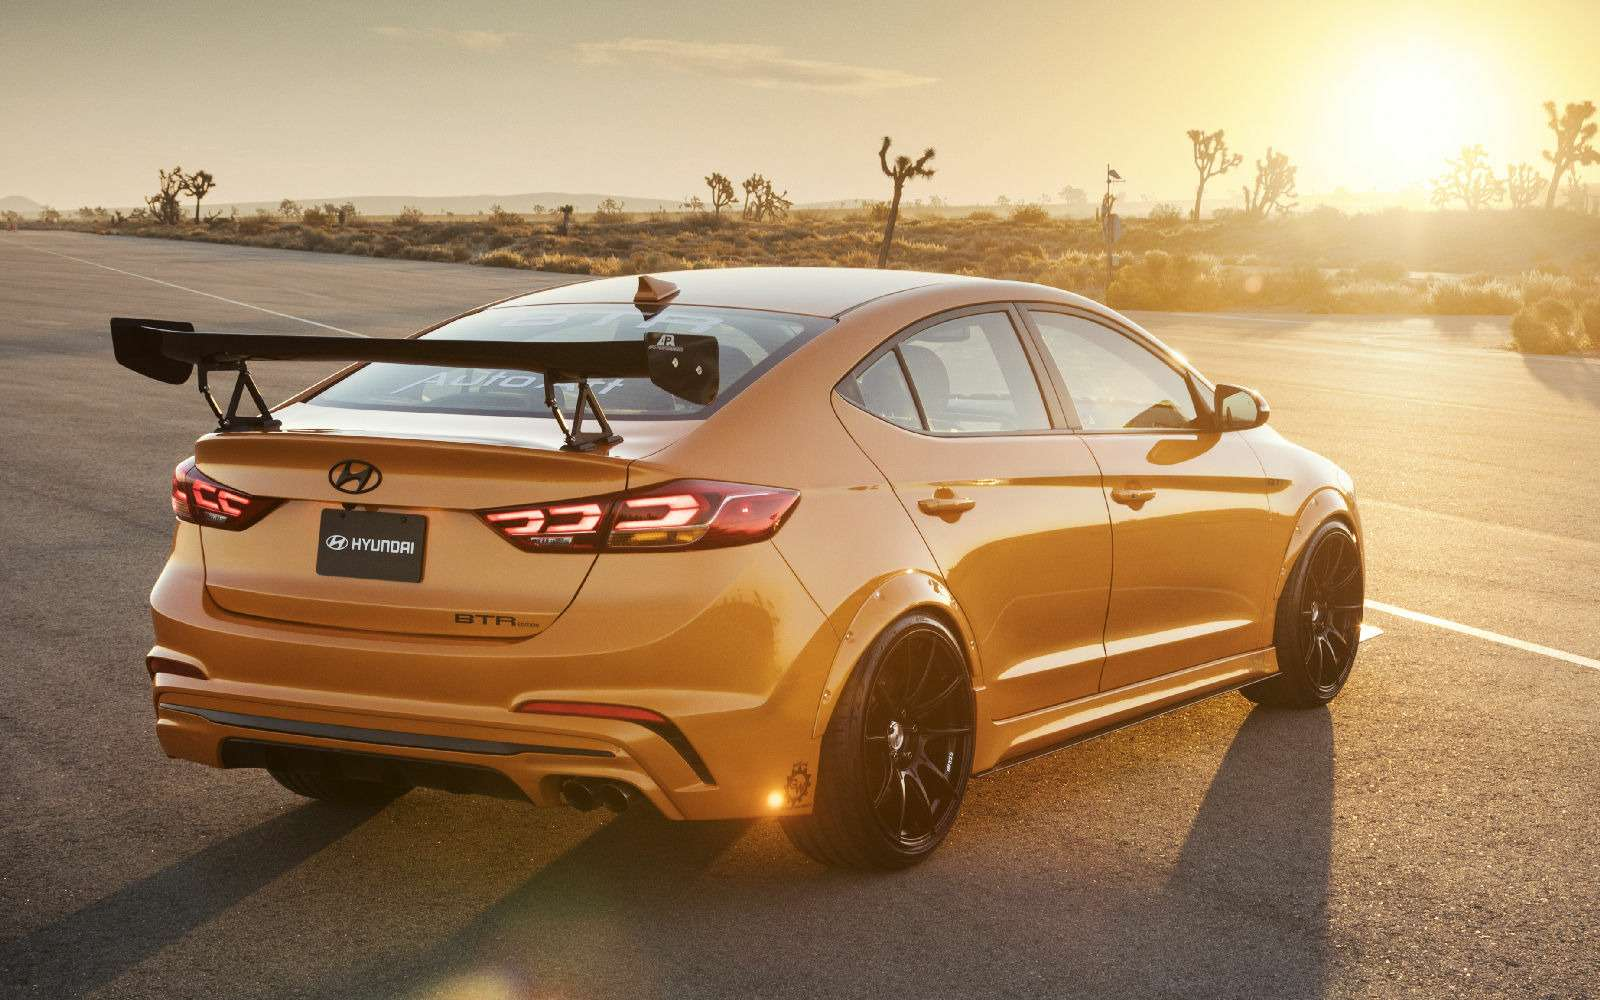 Тюнинг-шоу вЛас-Вегасе— крутые экспонаты Hyundai— фото 811980